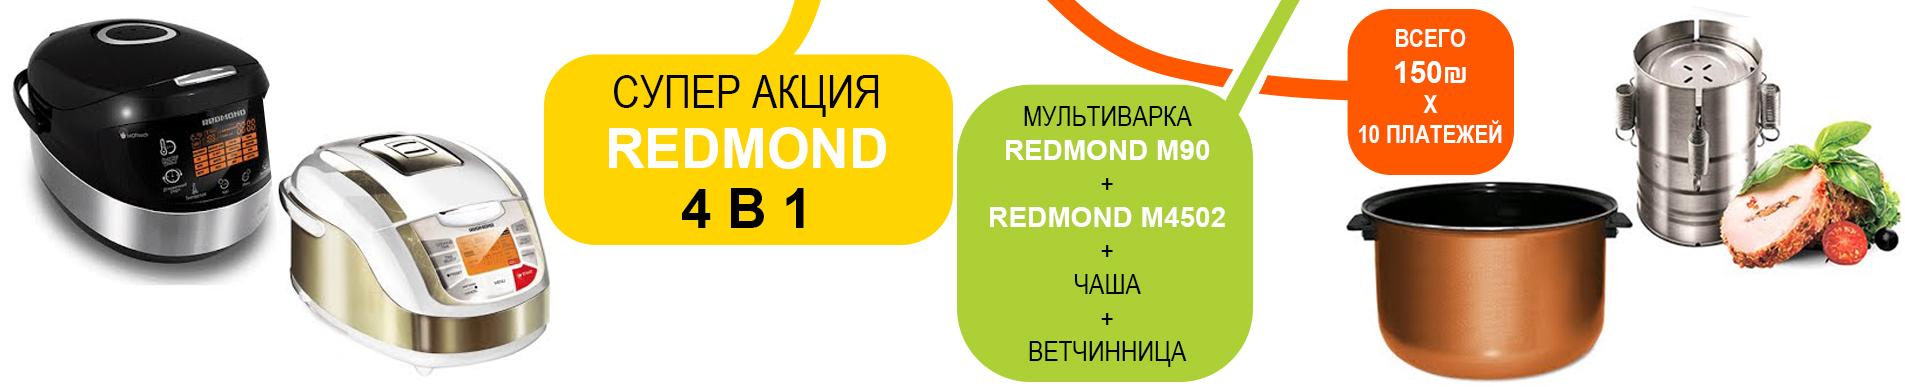 Redmond_new